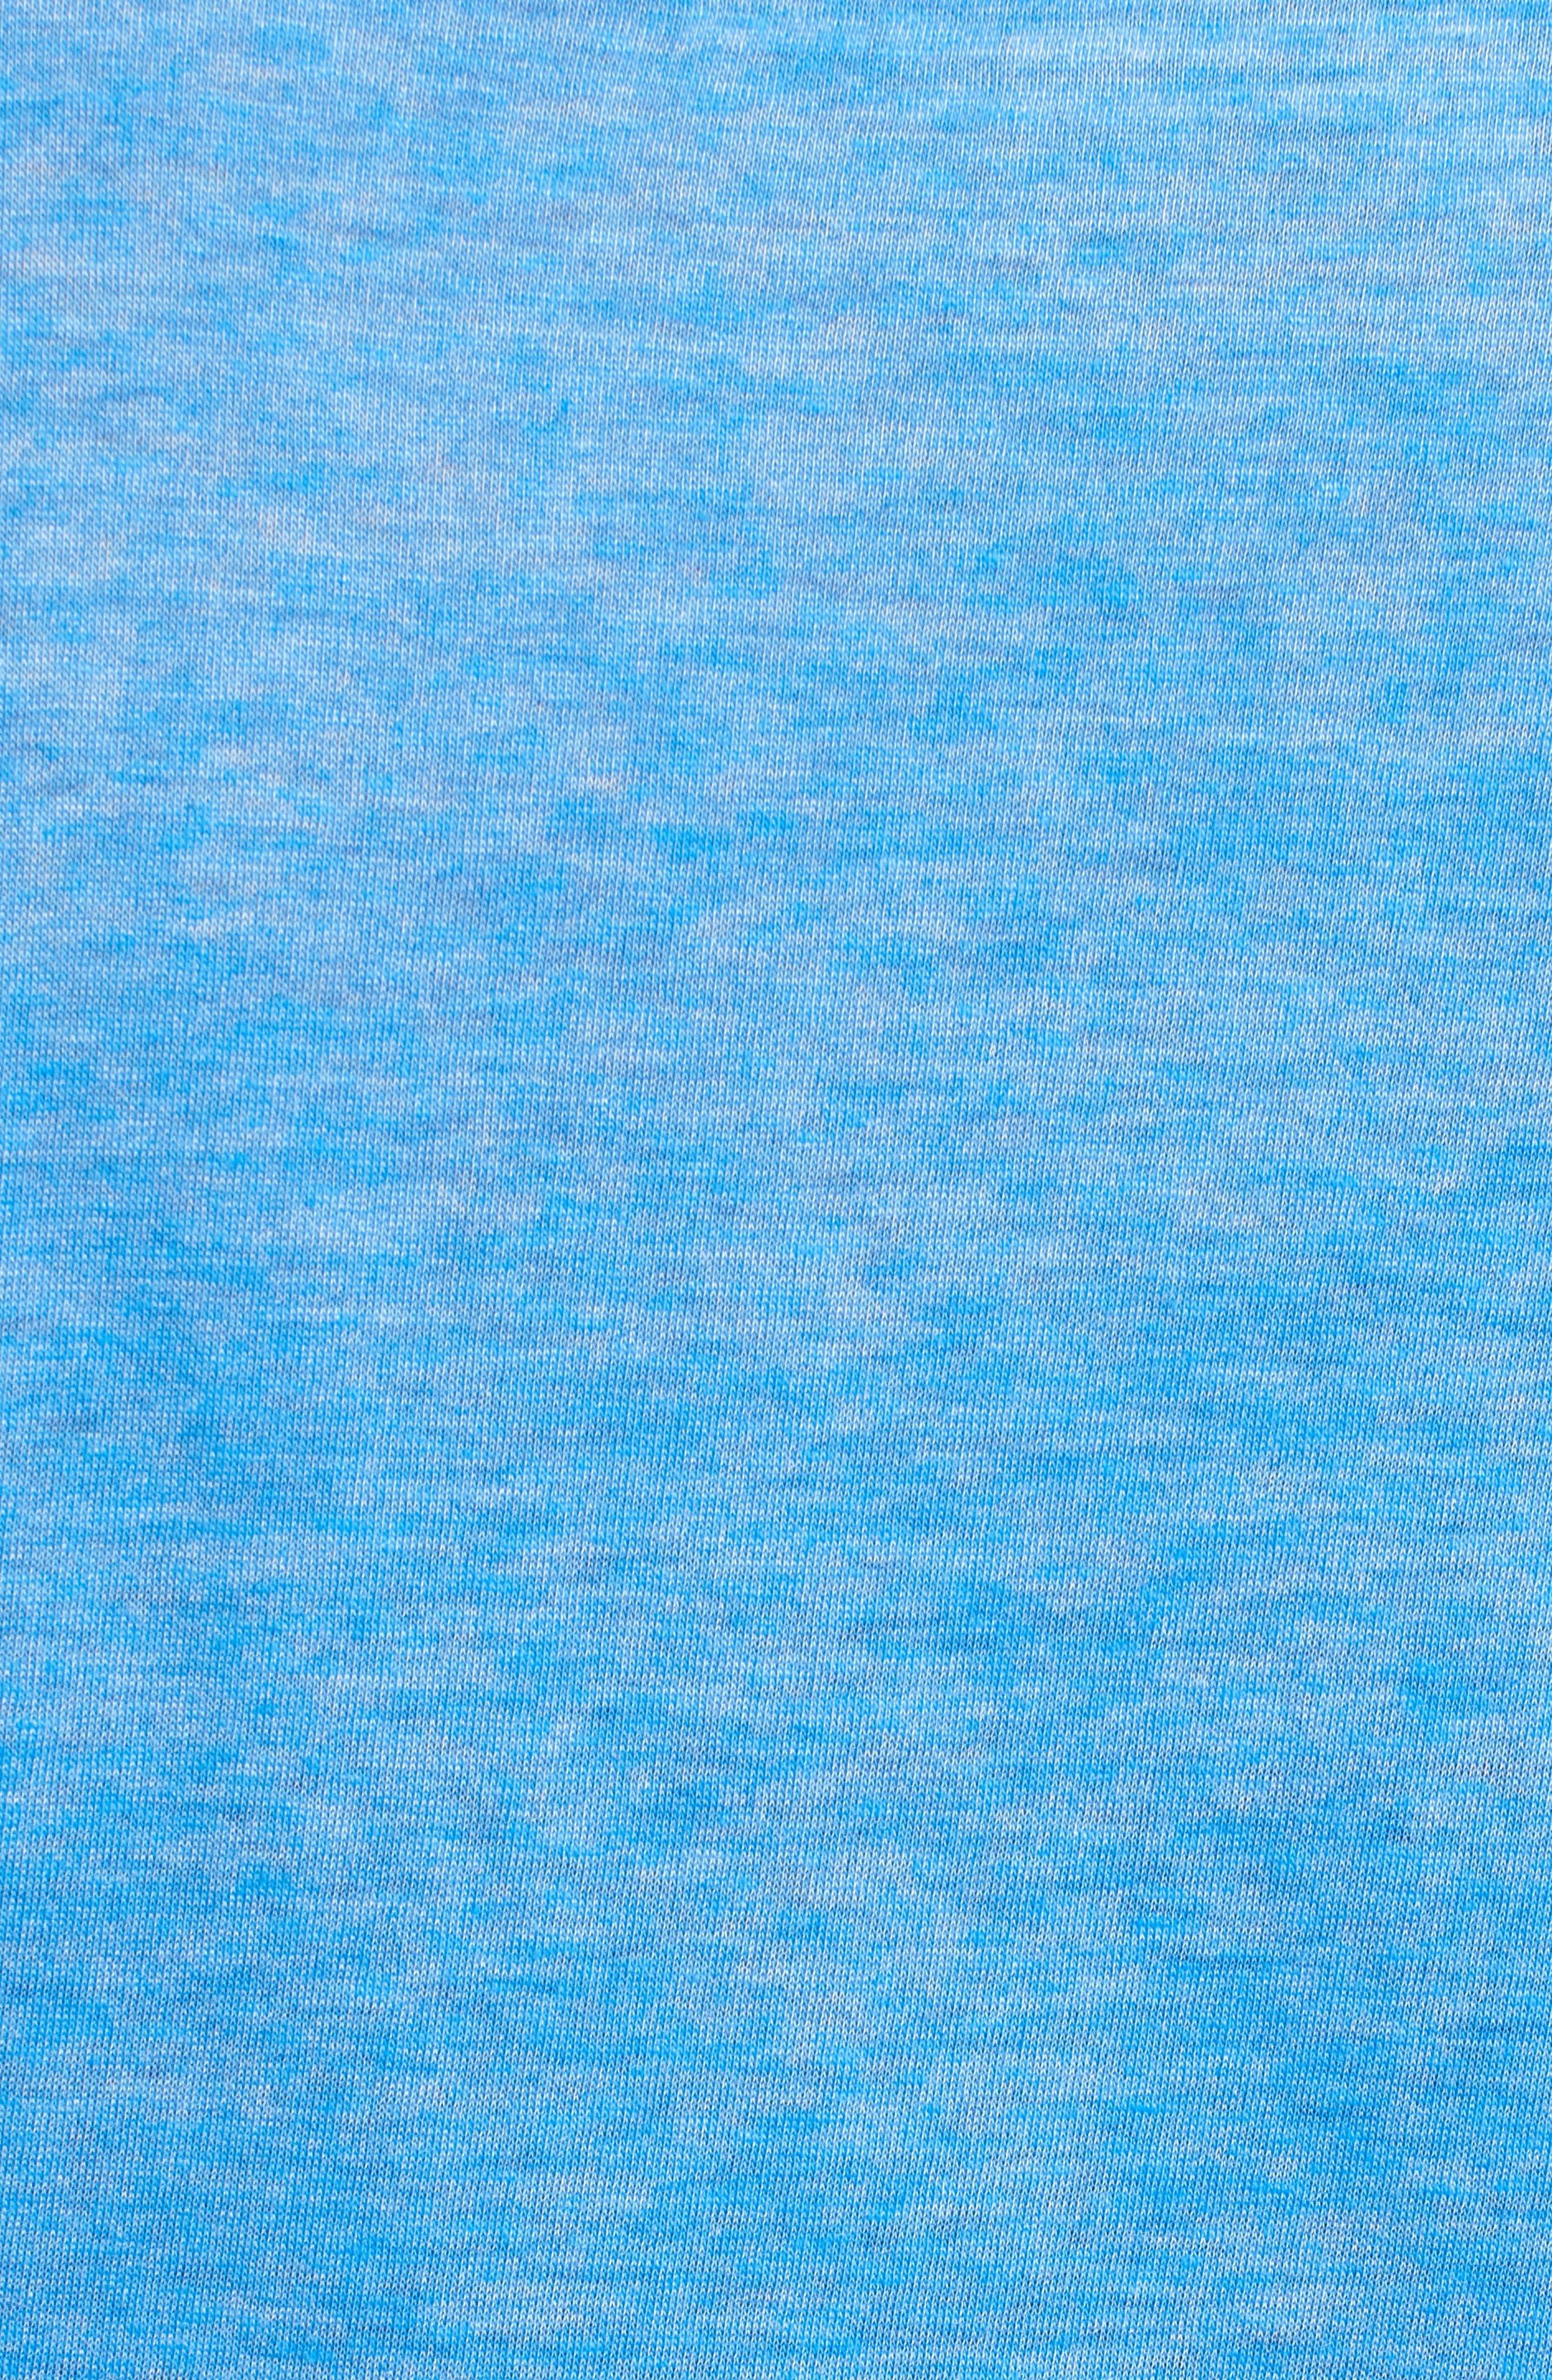 Burnout V-Neck T-Shirt,                             Alternate thumbnail 5, color,                             BLUE BLISS- WHITE BURNOUT